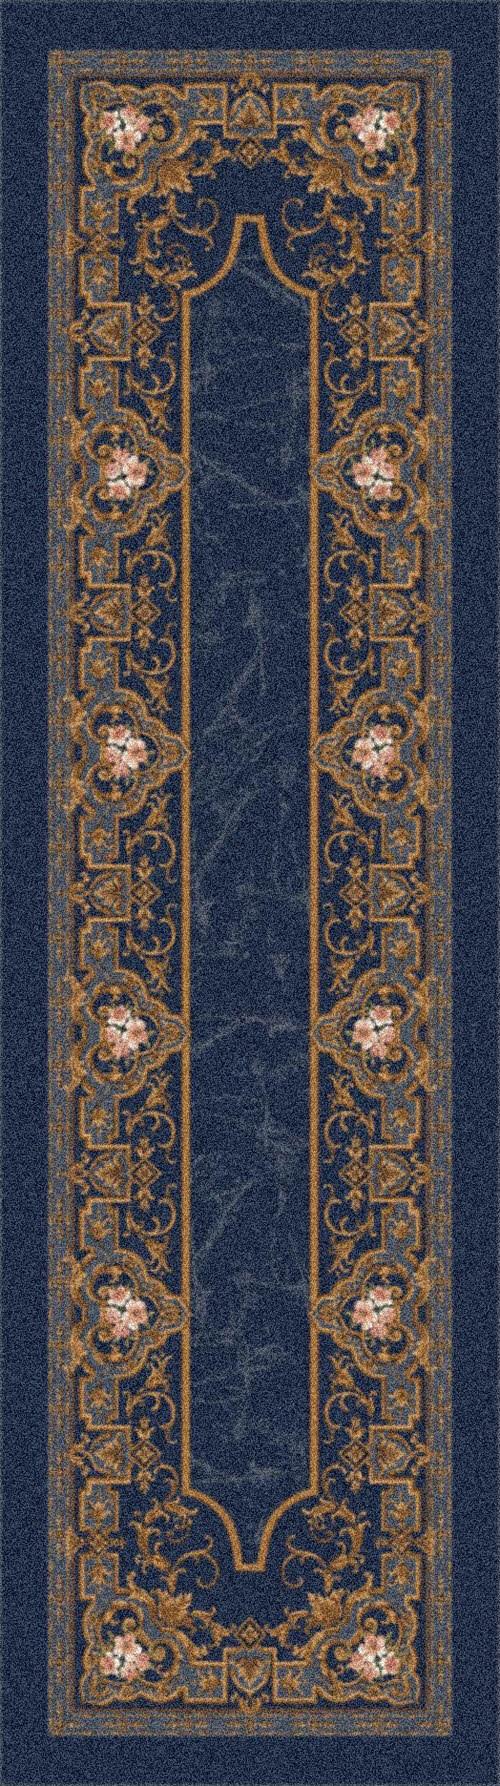 Phantom Blue (621)  Traditional / Oriental Area Rug